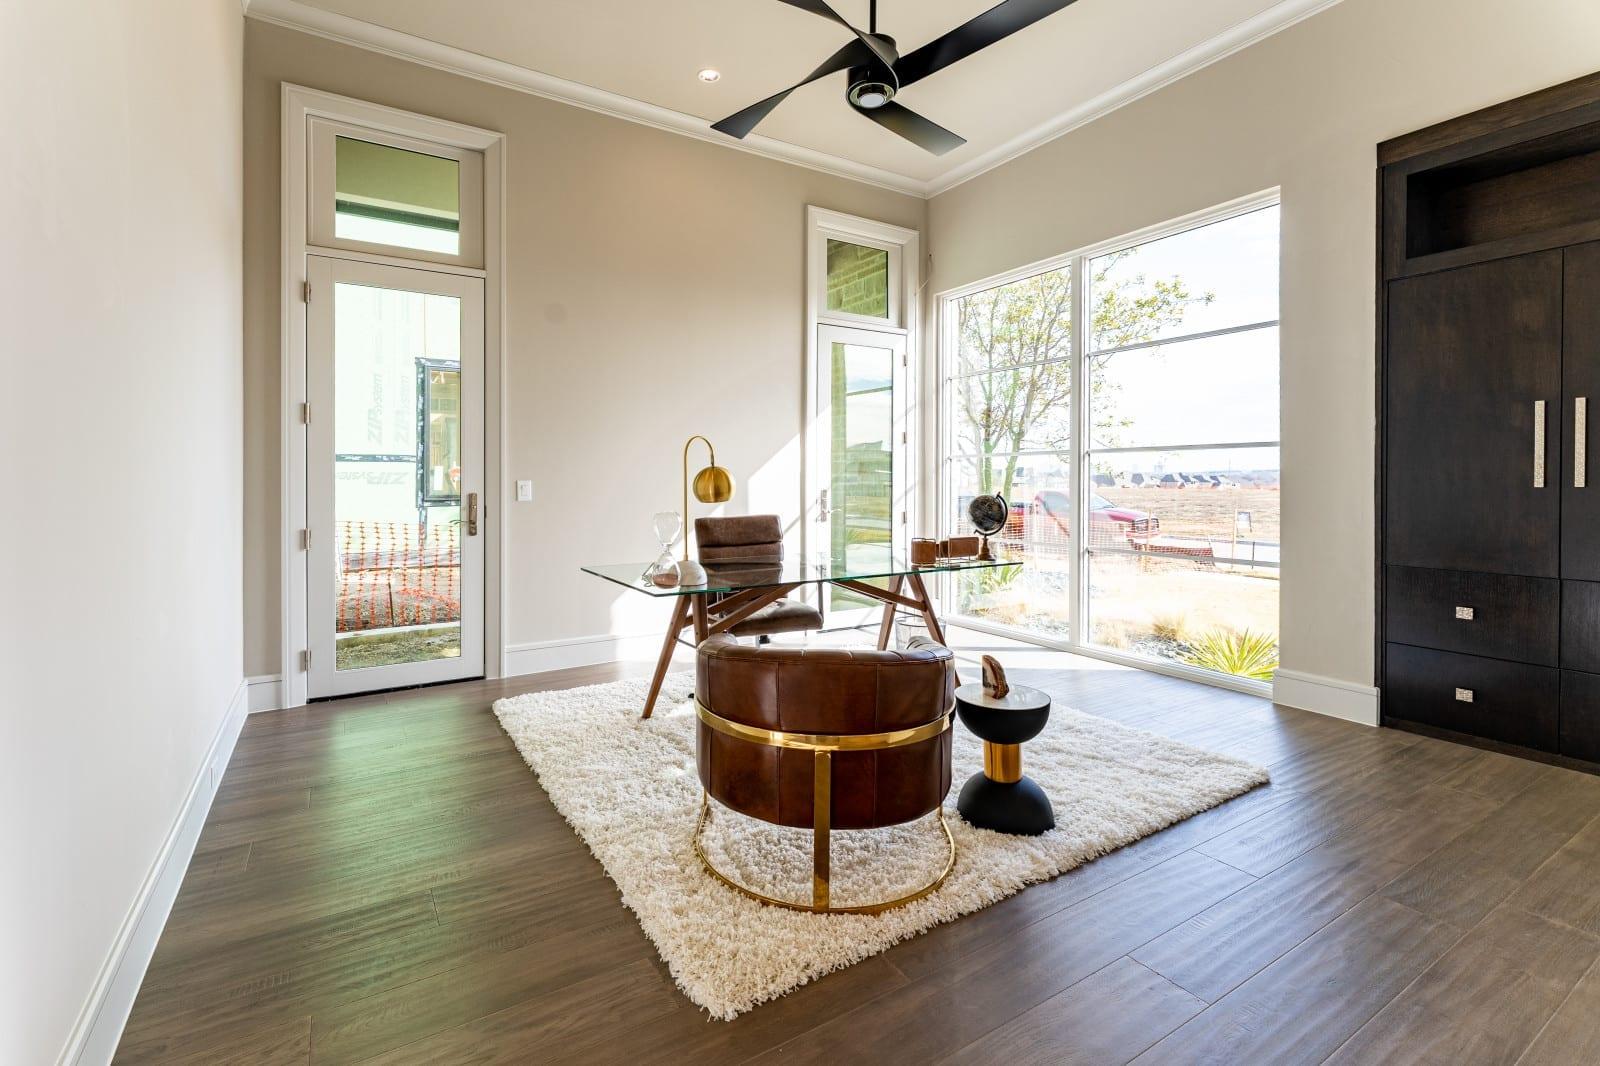 Modern Style Homes design # 8 - Millennial Design + Build